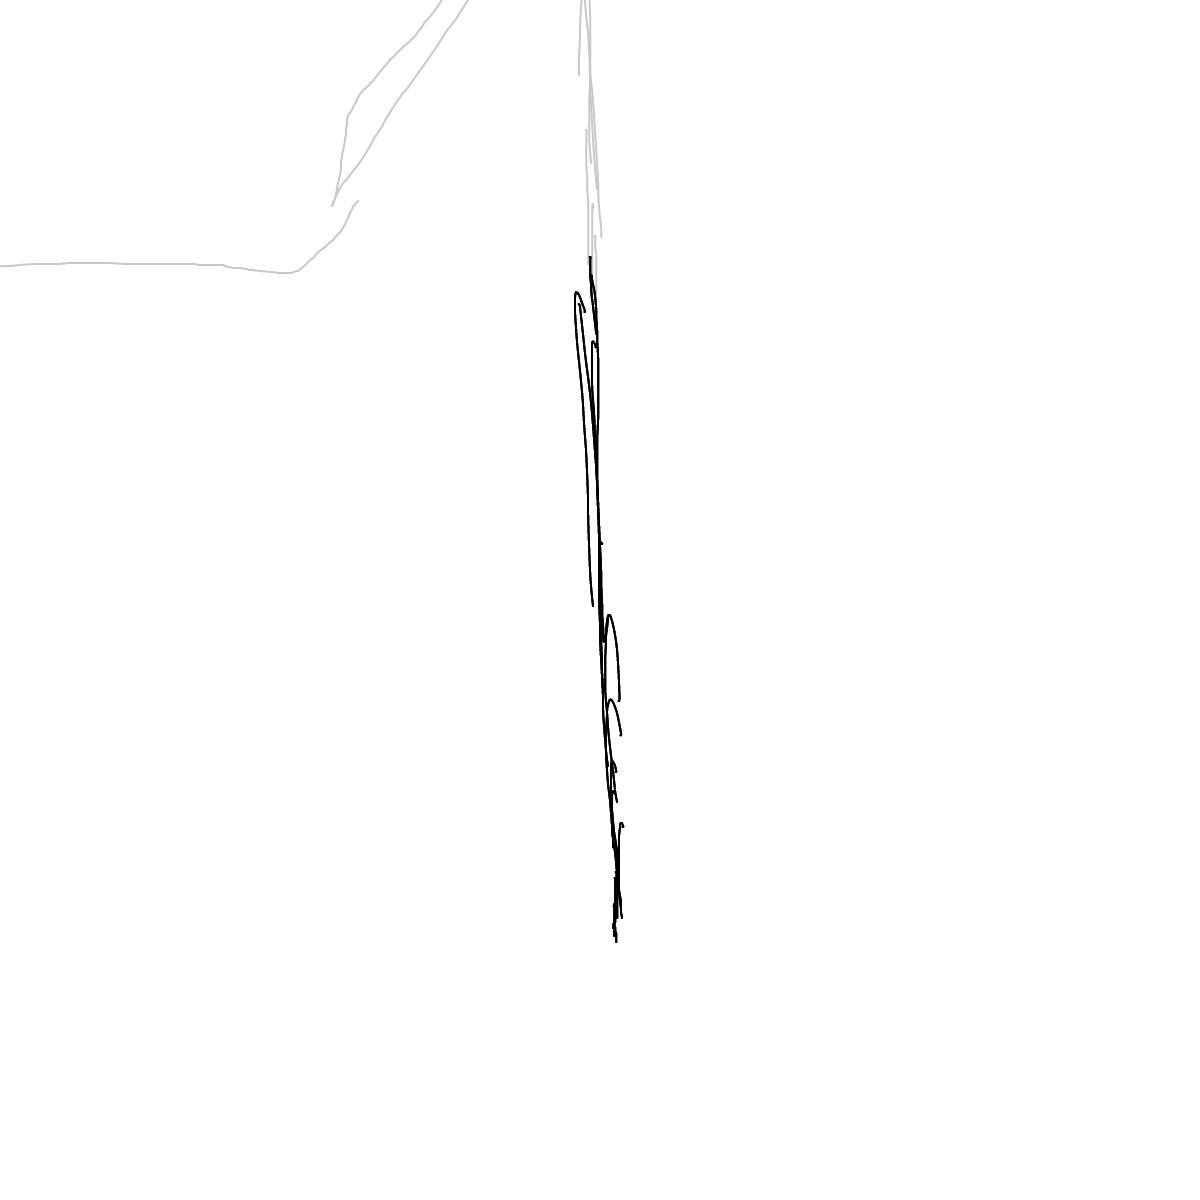 BAAAM drawing#2500 lat:52.0848808288574200lng: 5.1690077781677250